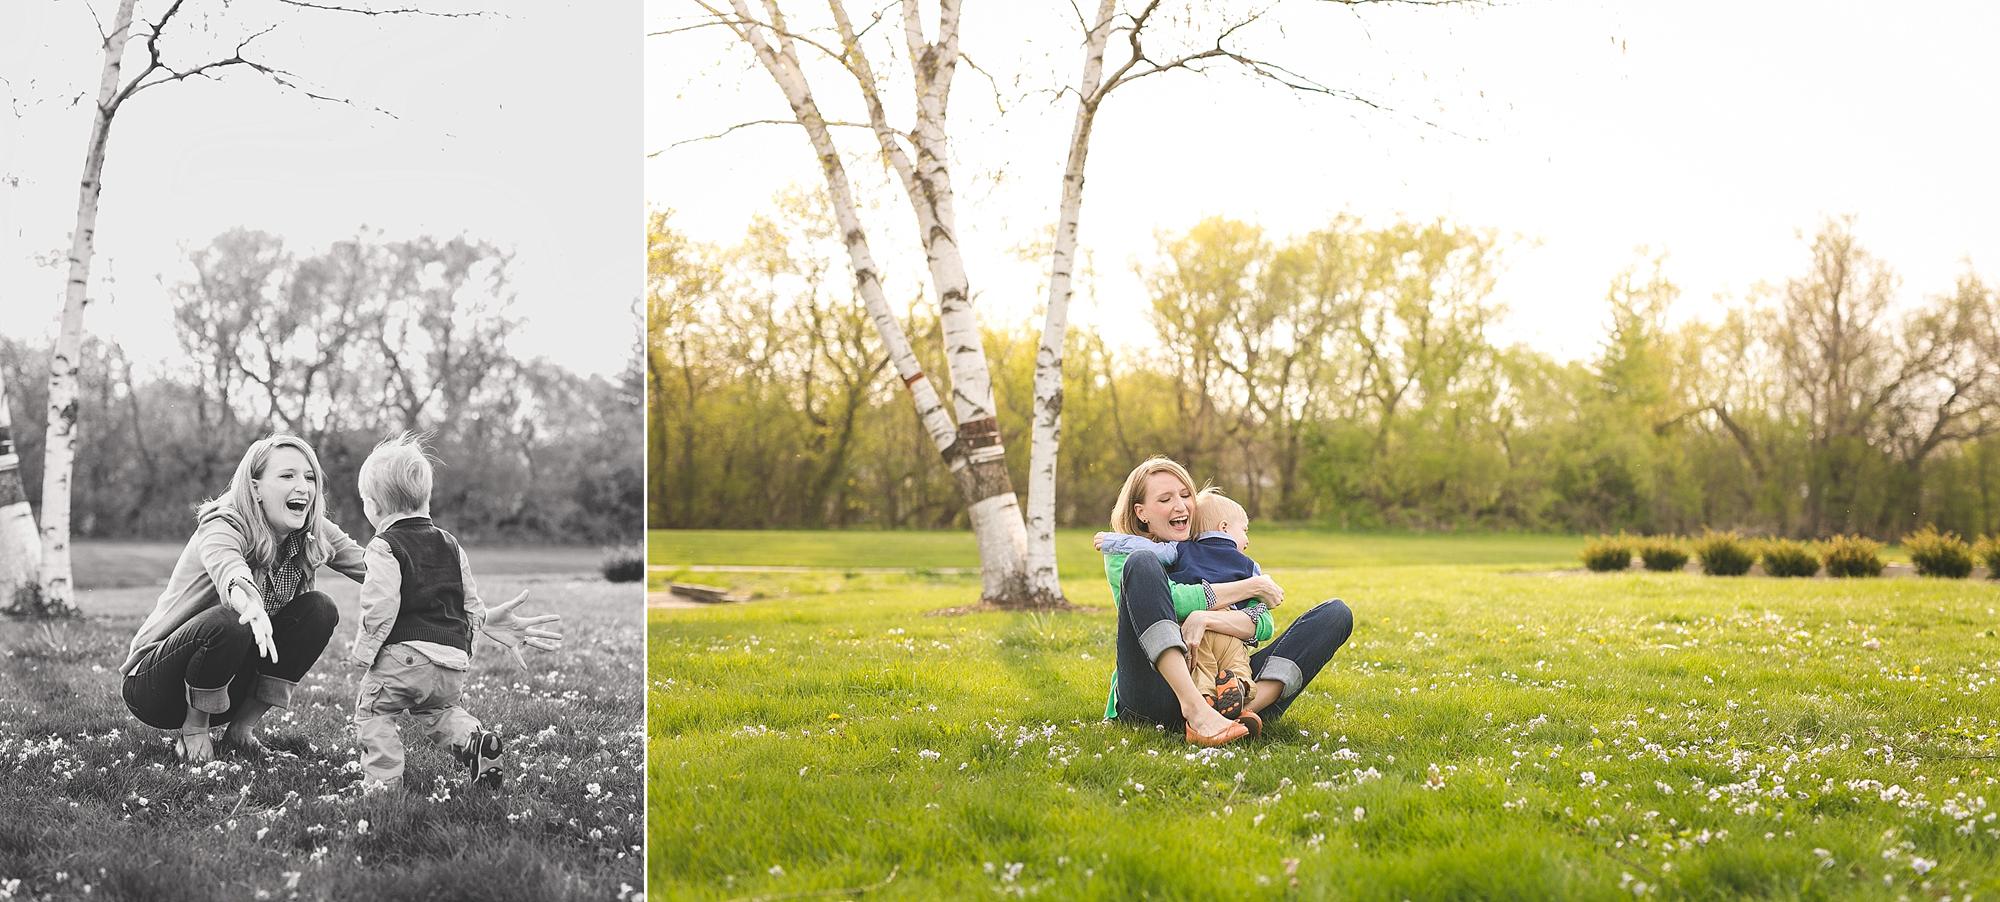 ashley vos photography seattle area lifestyle family photographer_0443.jpg